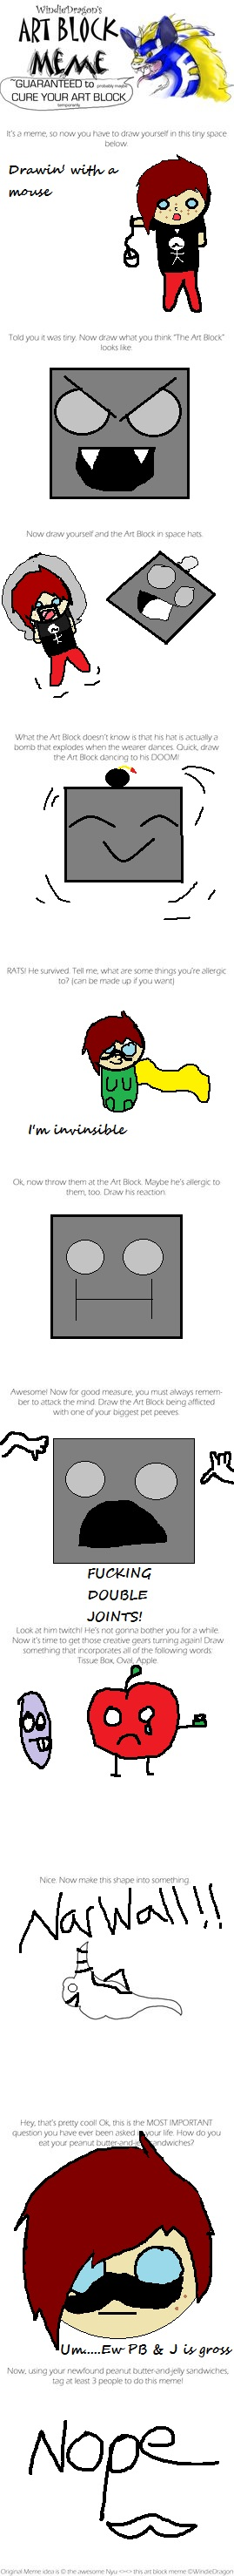 Art Block meme by BlahSoraBlah